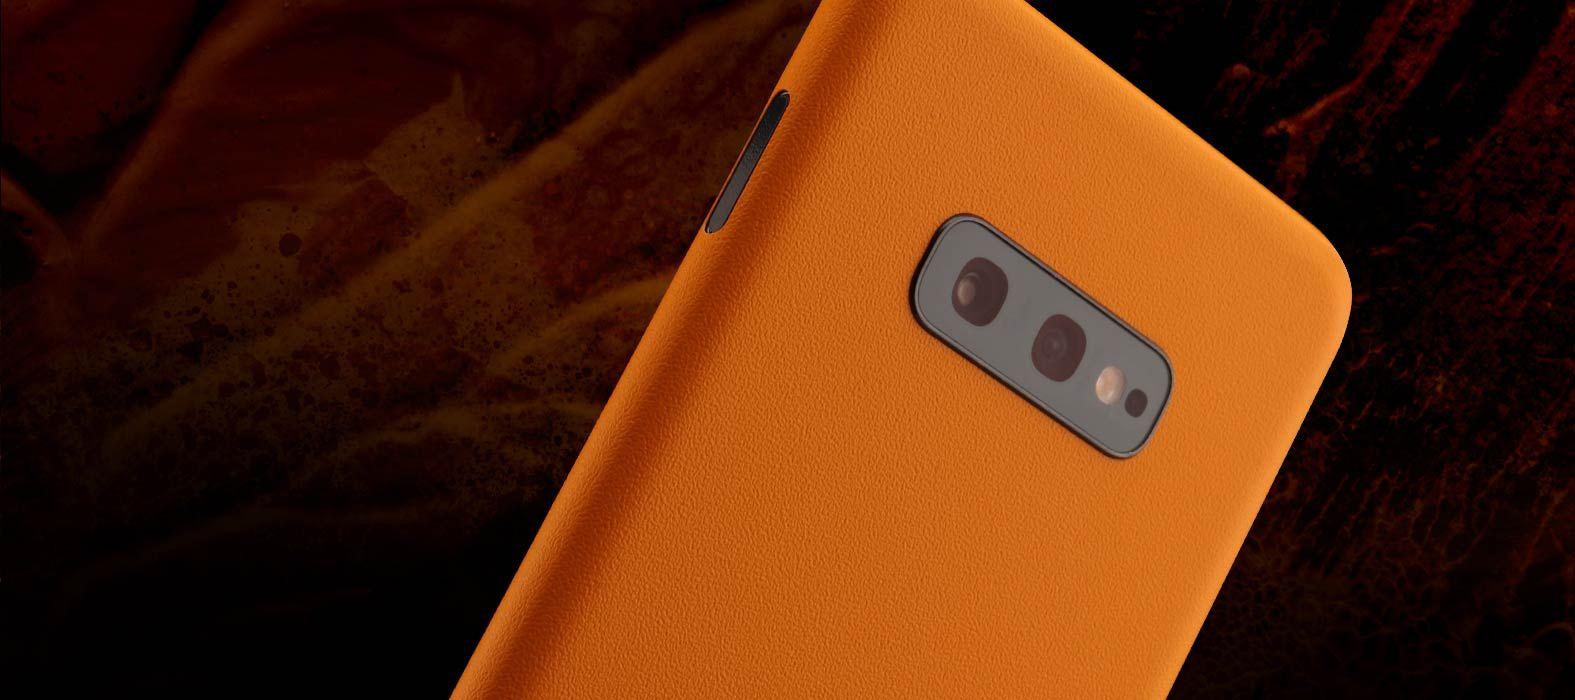 Galaxy S10e Sandstone orange skins